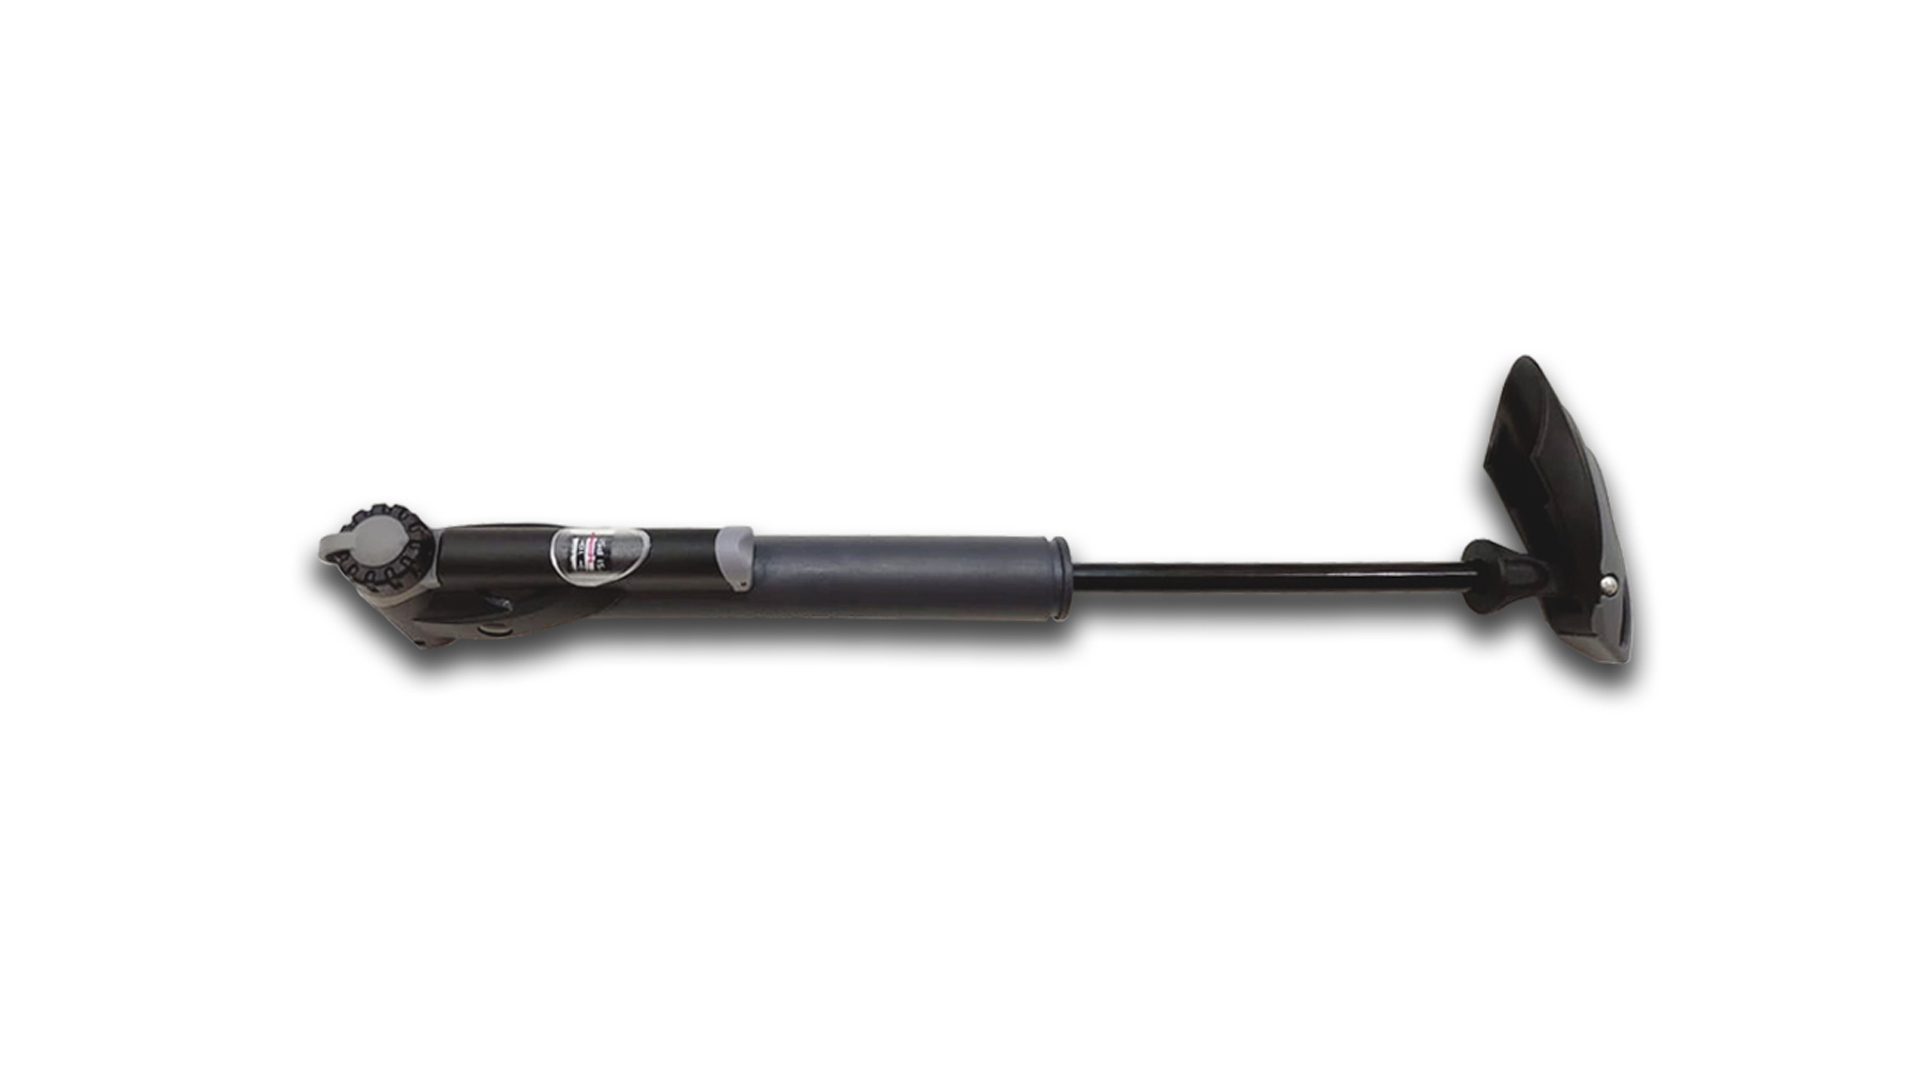 Bomba Mão Nylon C/Manom 100PSI P/S GP961 - High One/Giyo